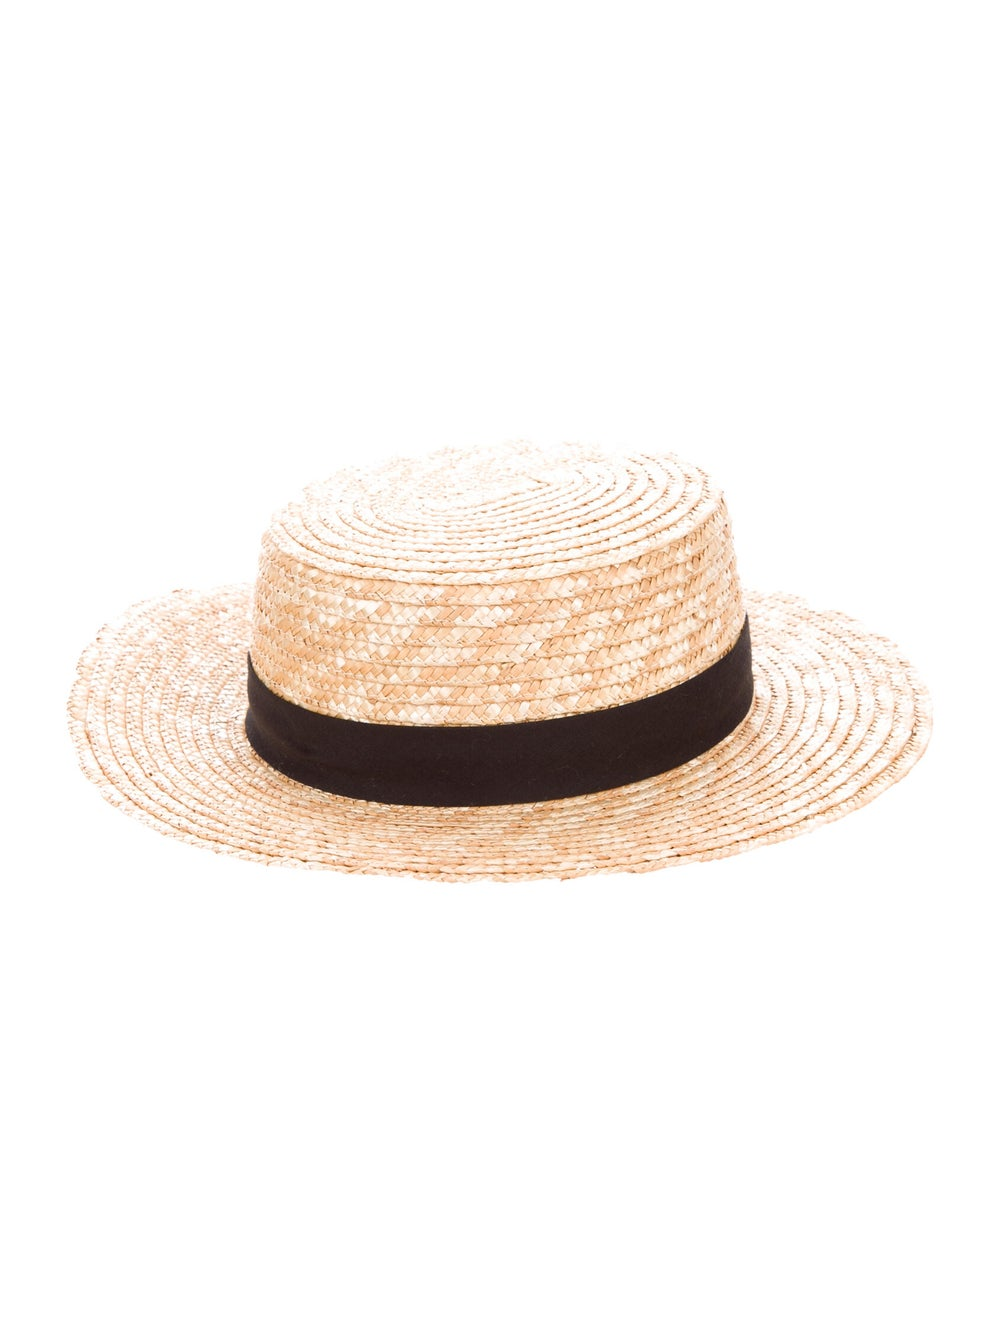 Adolfo Dominguez Straw Wide-Brim Hat Tan - image 2